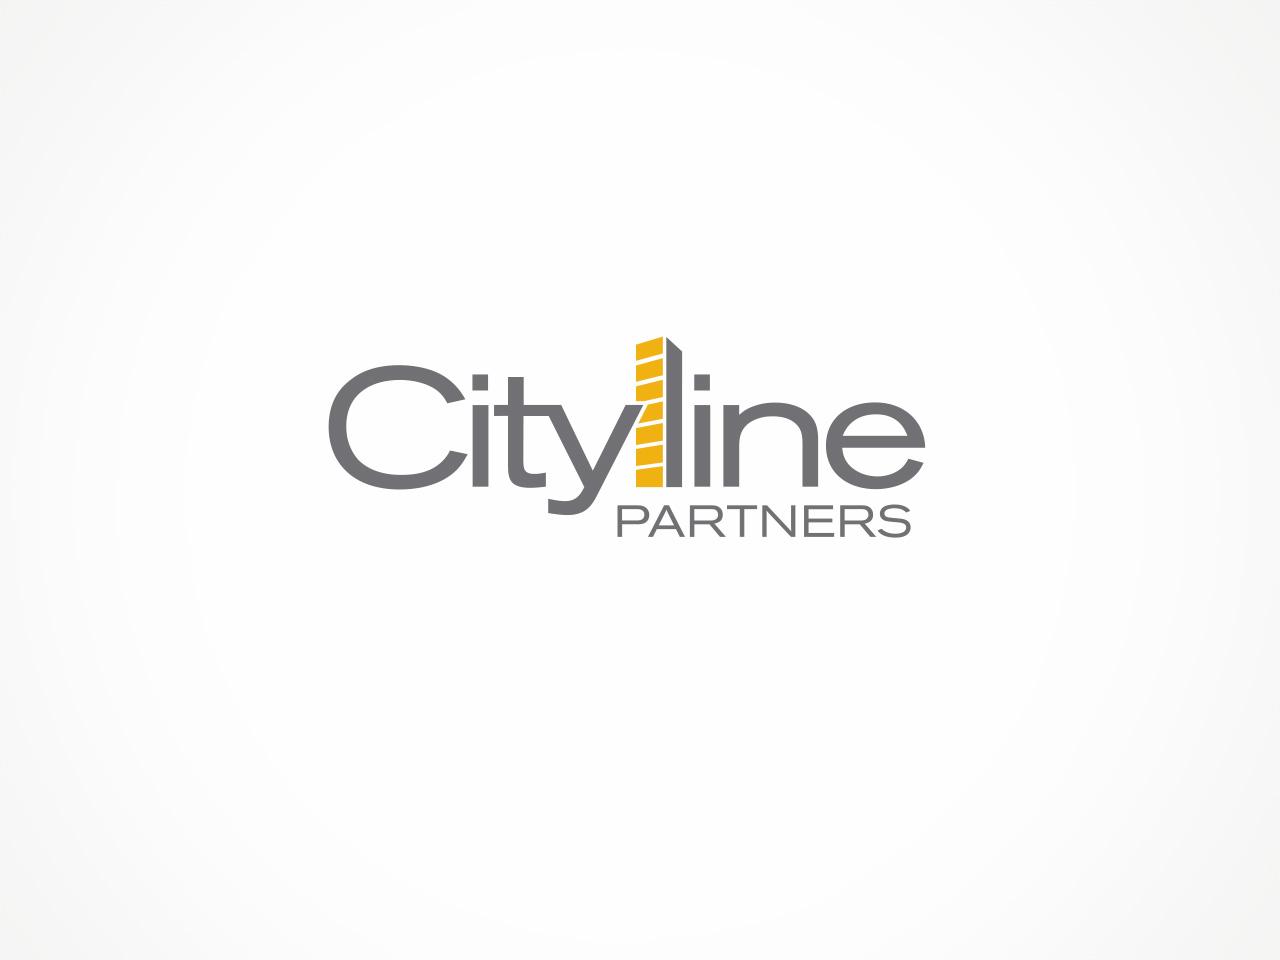 Cityline Partners logo